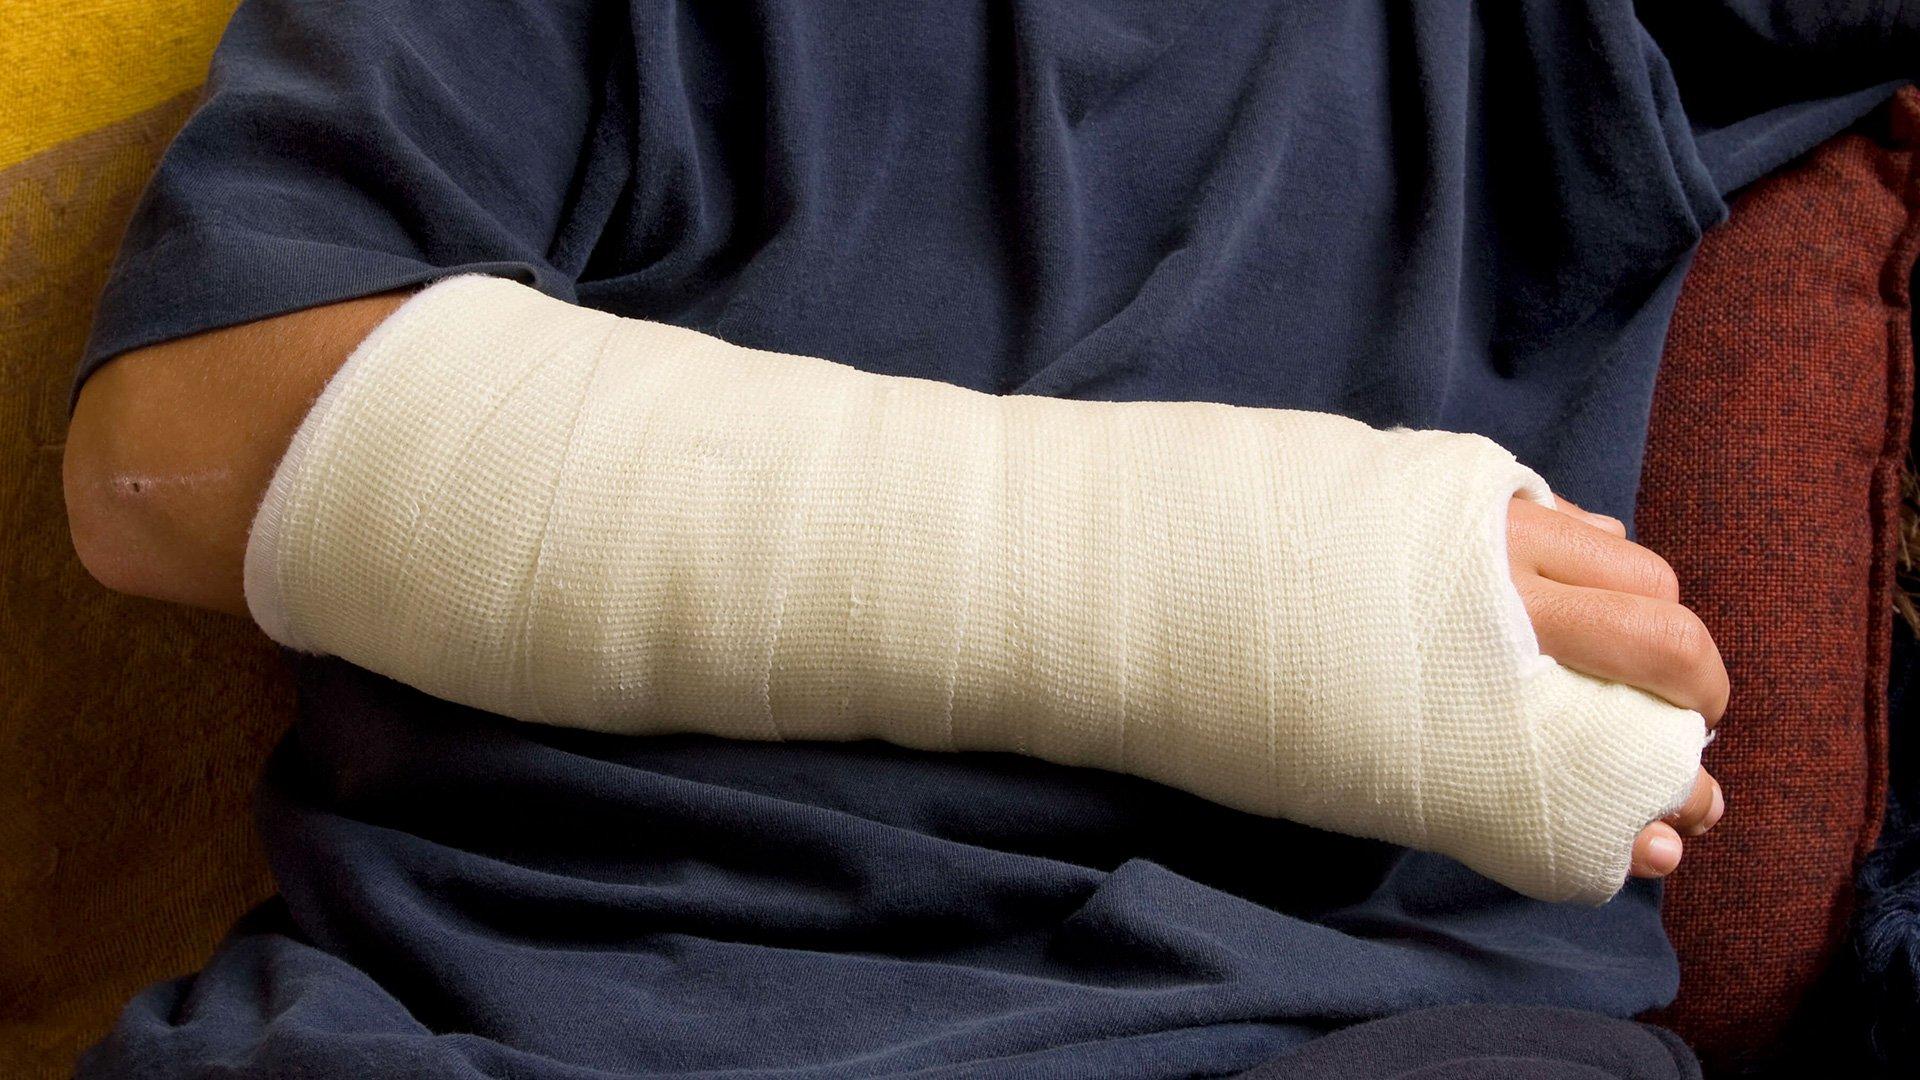 захотелось картинки про перелом руки во-вторых